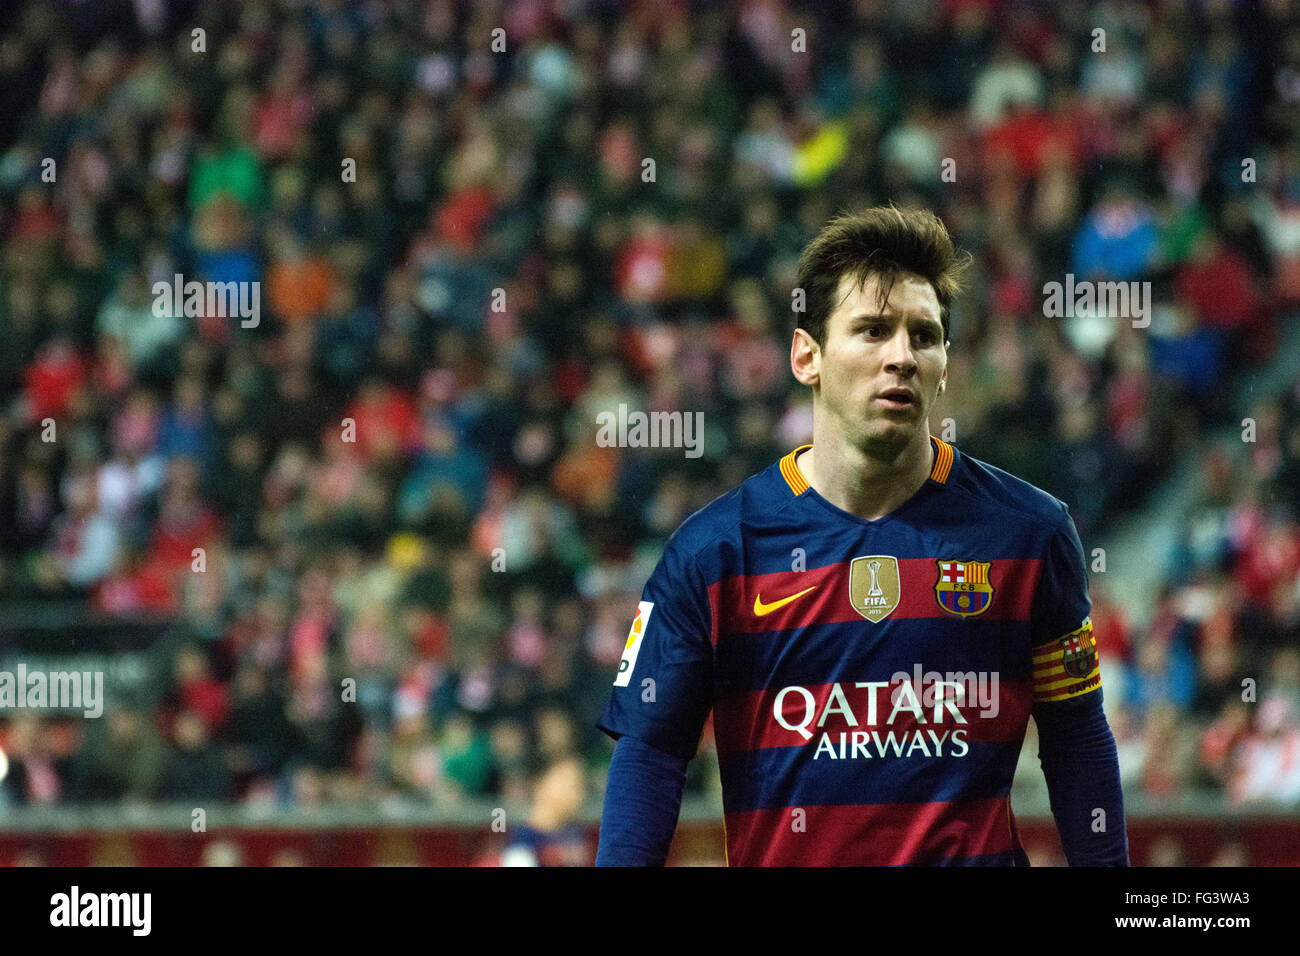 Gijon, Spain. 17th February, 2016. Lionel Messi (forward, FC Barcelona) during football match of Spanish 'La - Stock Image